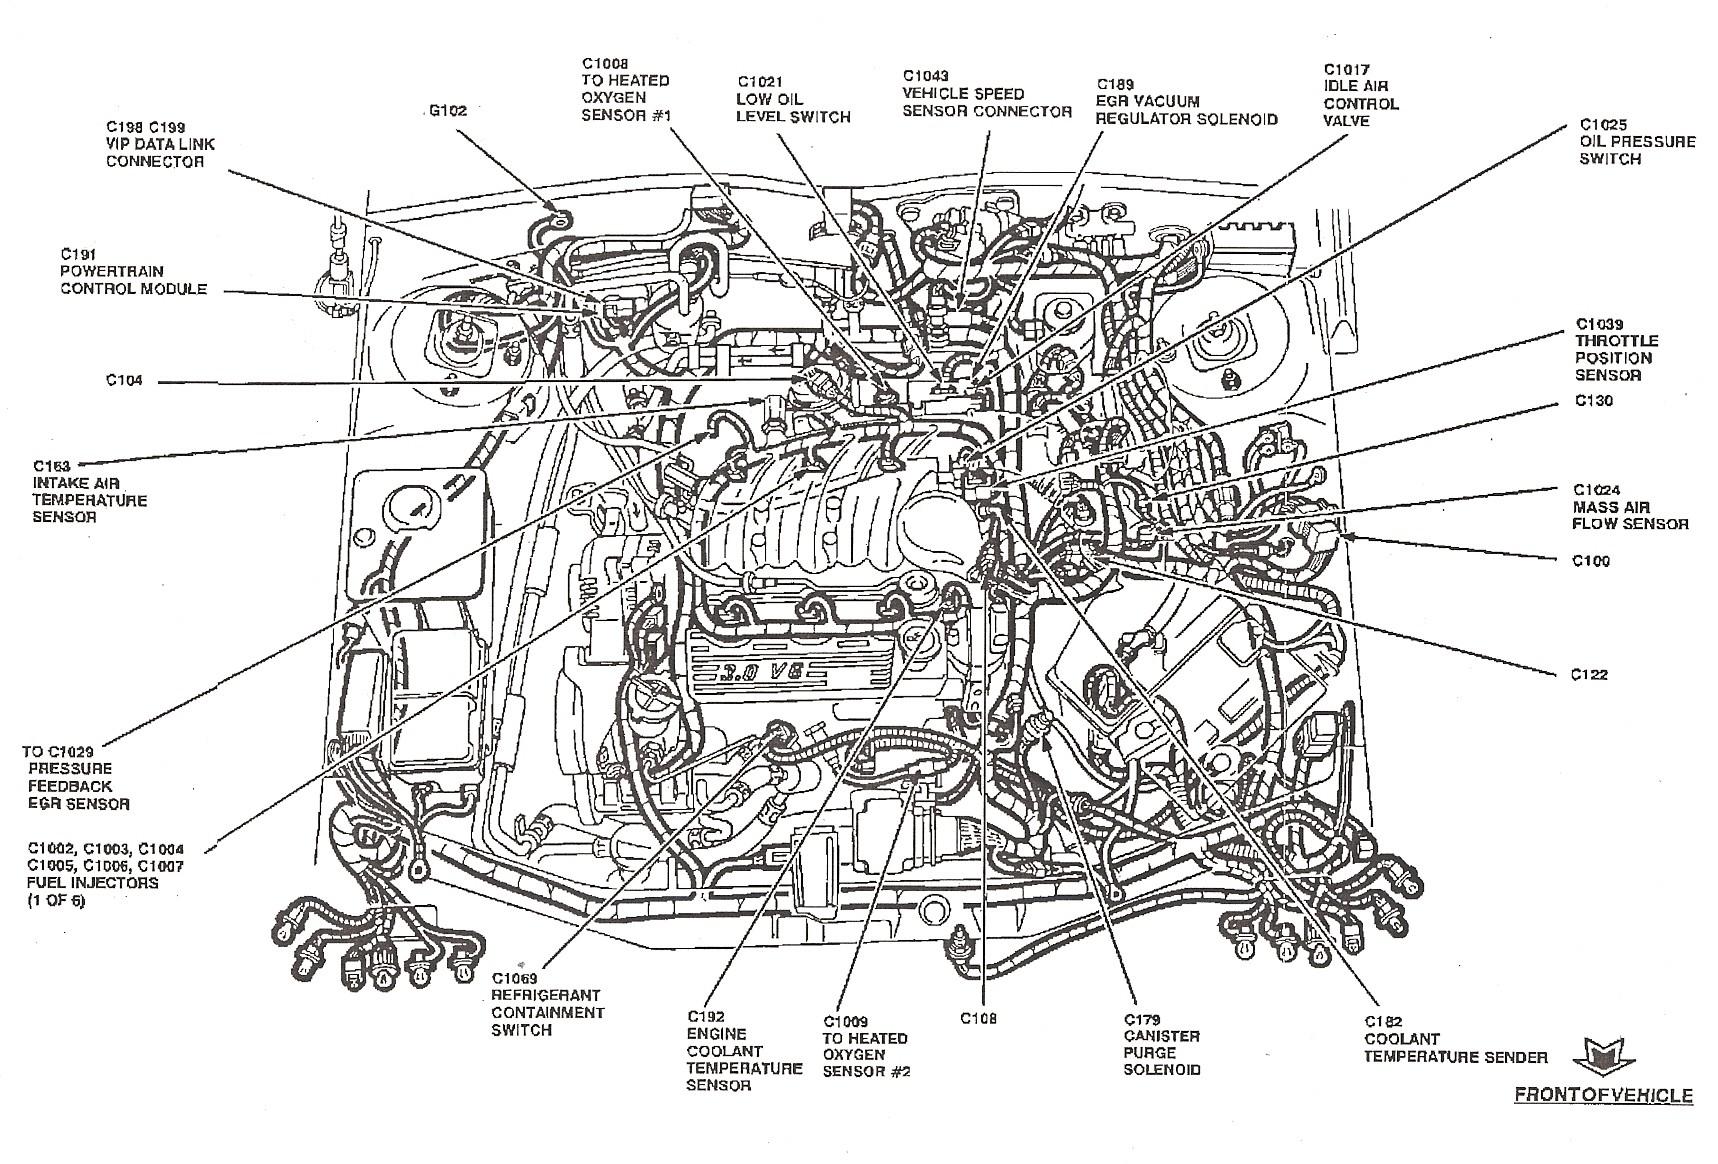 hight resolution of 2000 ford focus engine parts diagram u2022 wiring diagram for free 2011 kawasaki teryx 2012 kawasaki teryx yellow